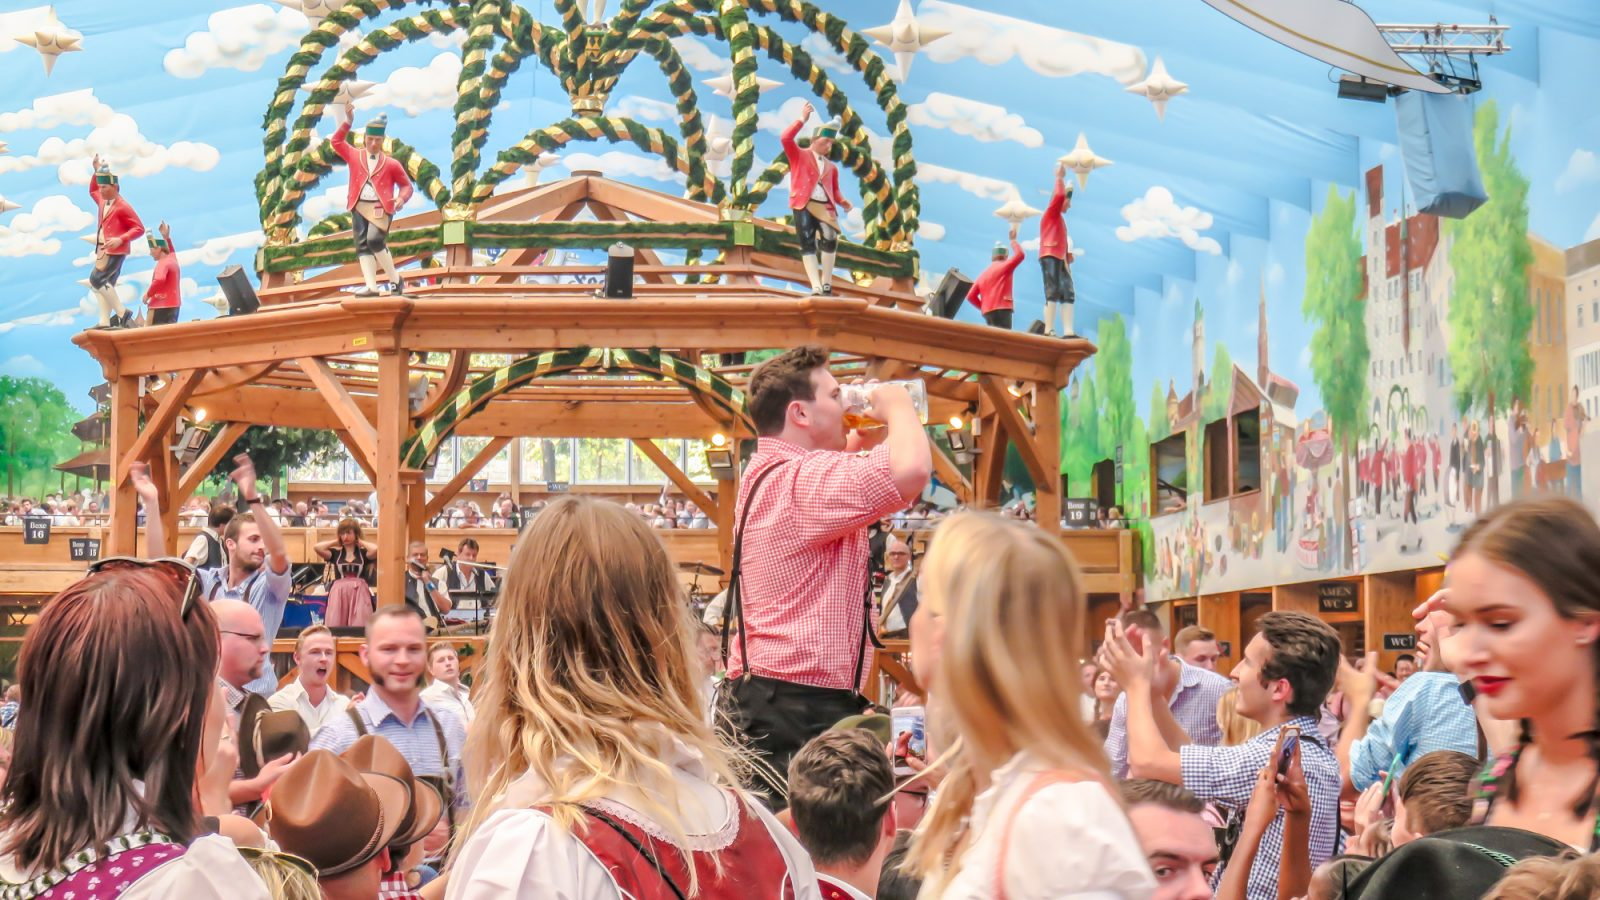 Oktoberfest trivia 49+ Super Detailed Oktoberfest Tips From an Oktoberfest Tour Guide   Oktoberfest in Munich, Germanyquiz cover photo